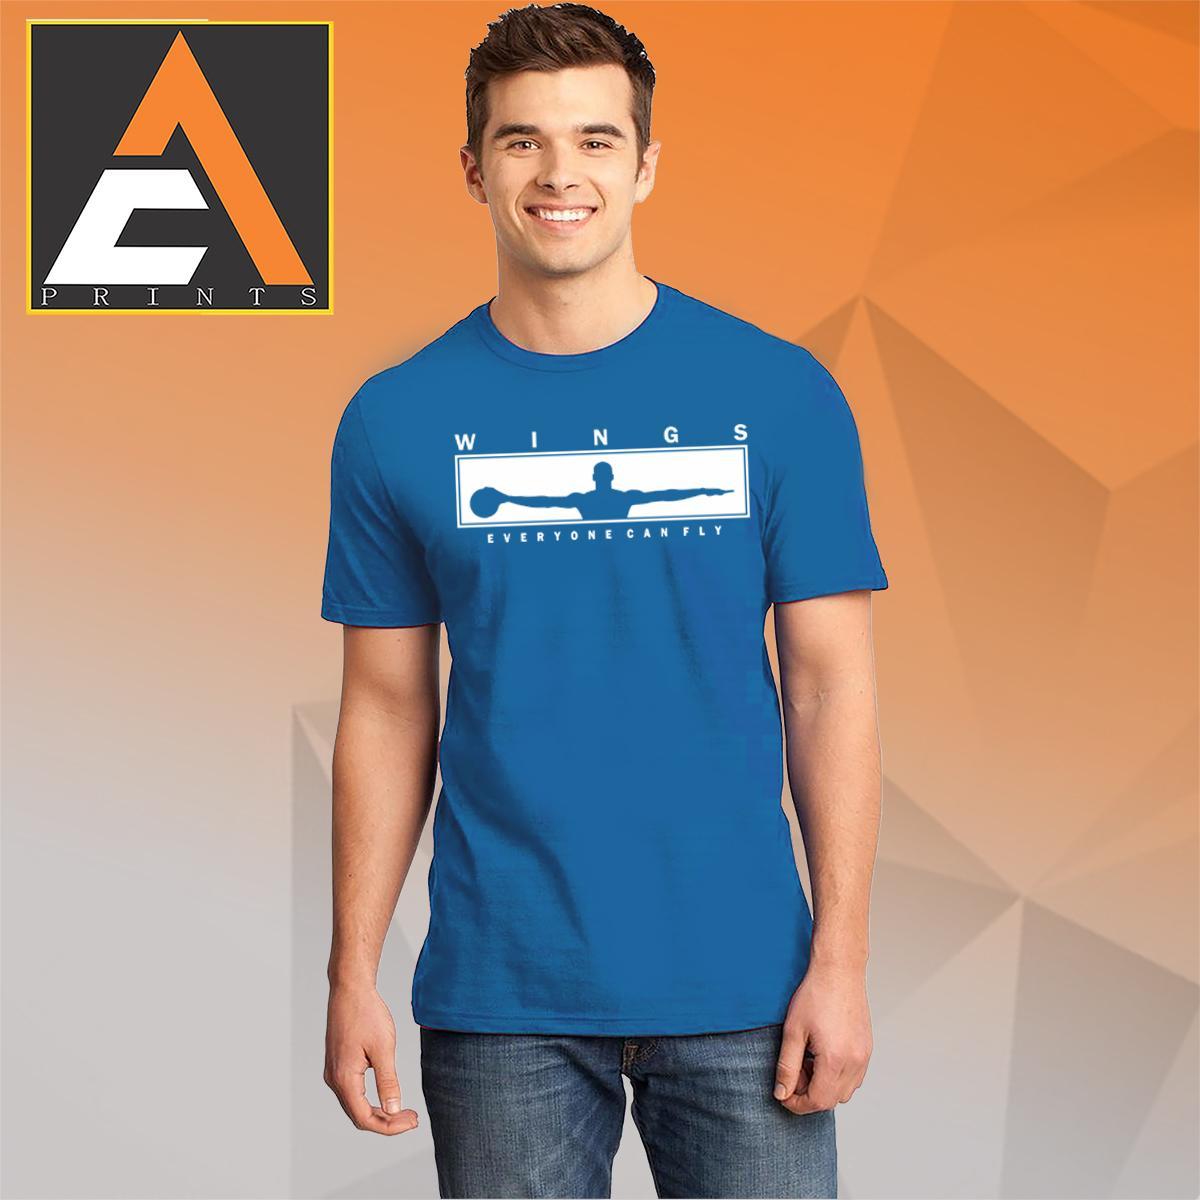 1276eb7089b5c4 Jordan shirt Michael Jordan shirt Basketball tshirt Basketball shirt  WINGS01 Shirt Unisex(Men Women